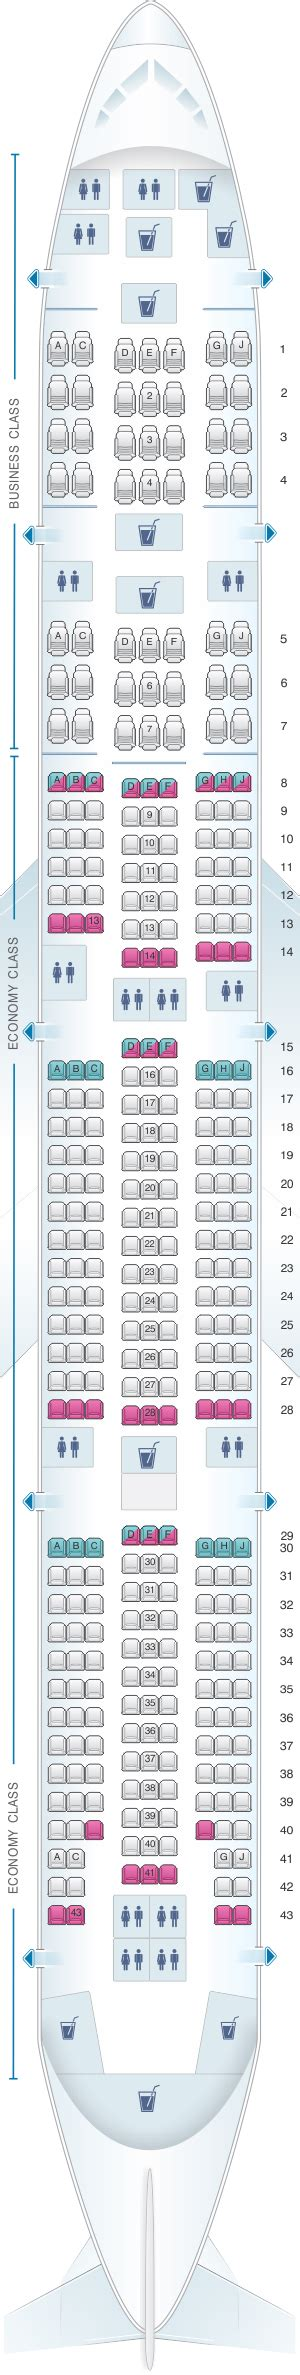 seat map egyptair boeing b777 300 seatmaestro